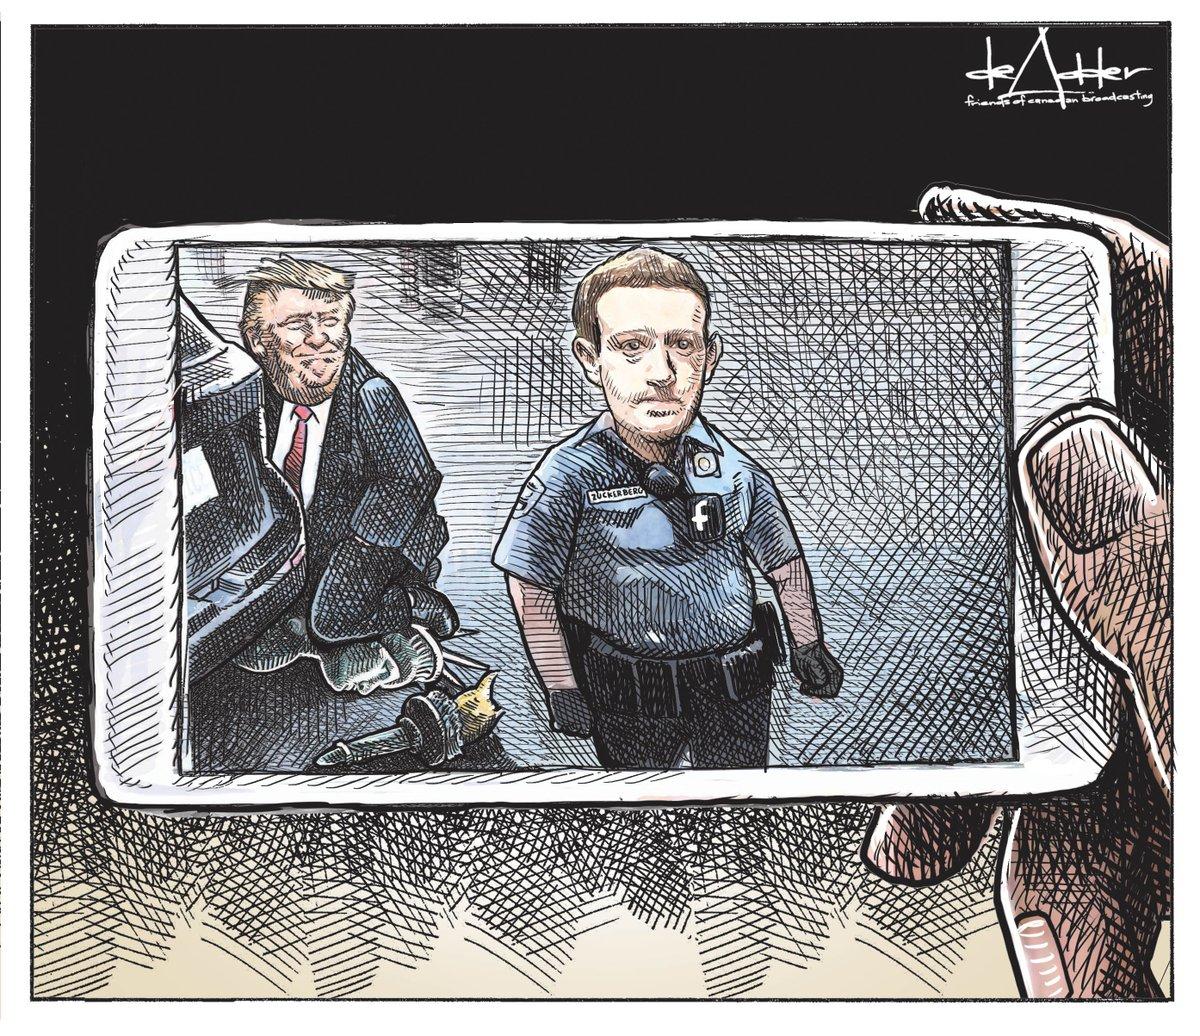 Cartoon for @friendscb @AMISRadiodiff #MarkZuckerberg #Facebook #FacebookIsOverParty